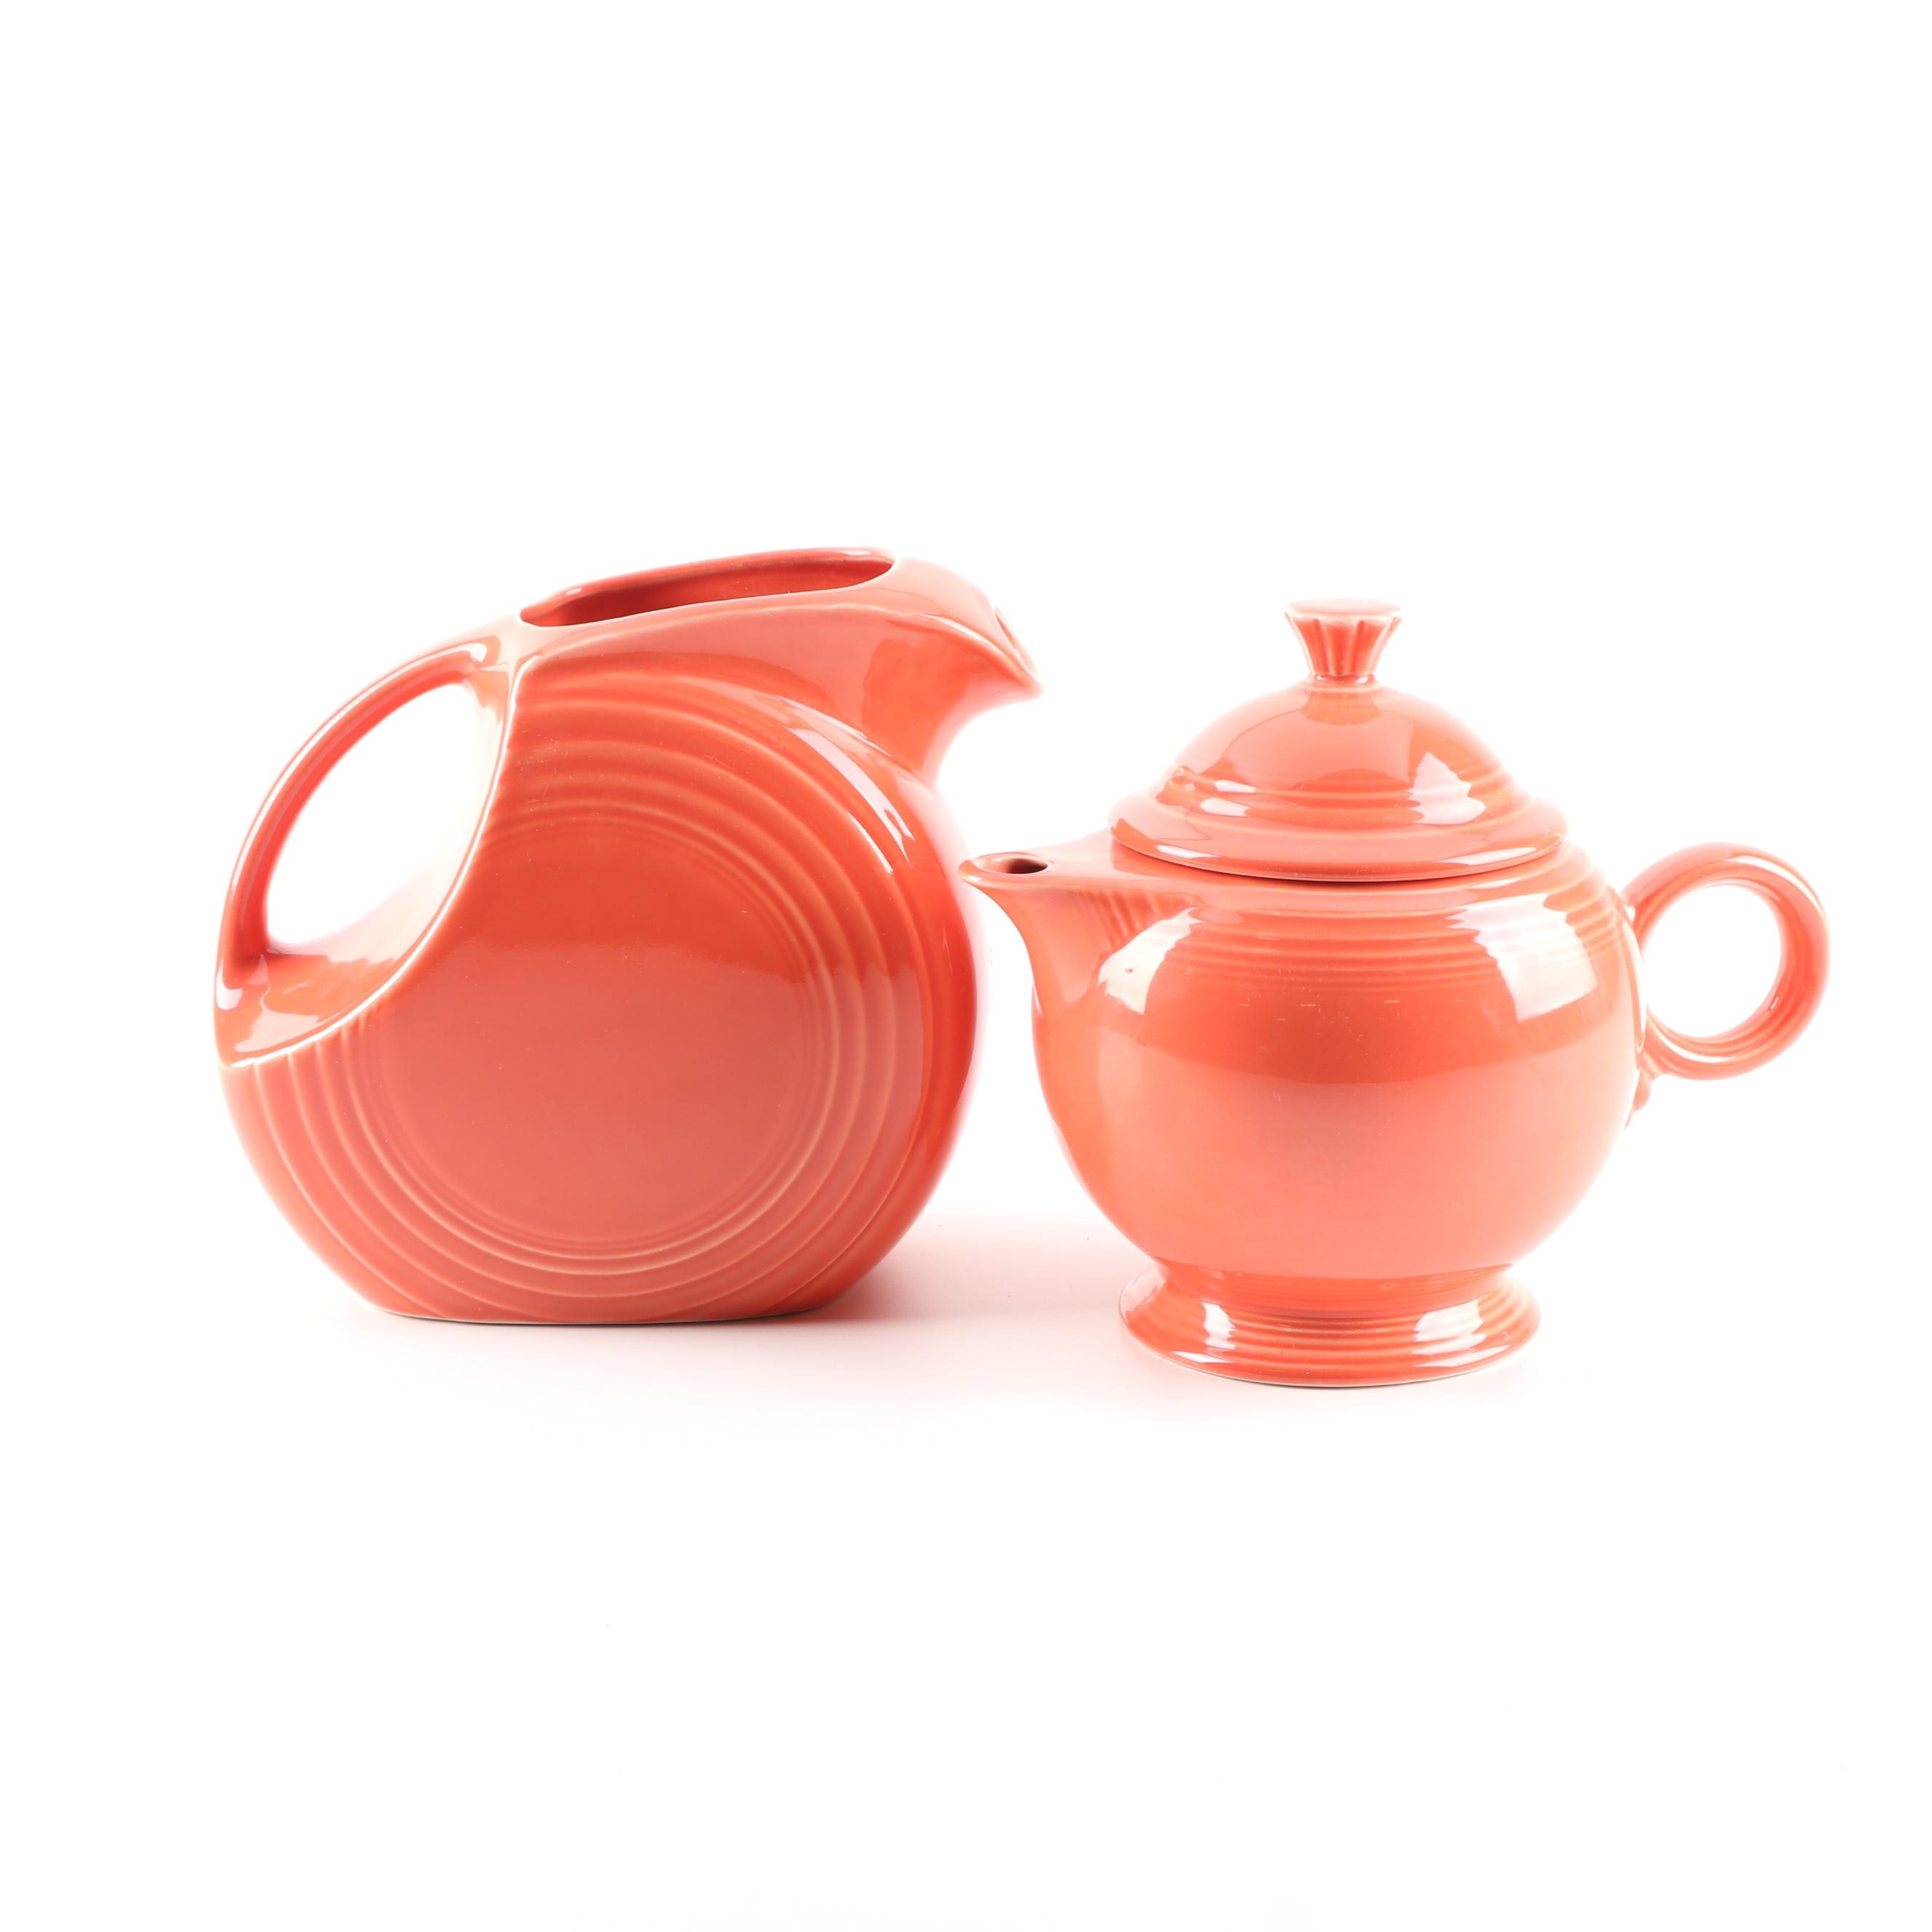 "Homer Laughlin Persimmon ""Fiesta"" Ceramic Disk Pitcher and Teapot"